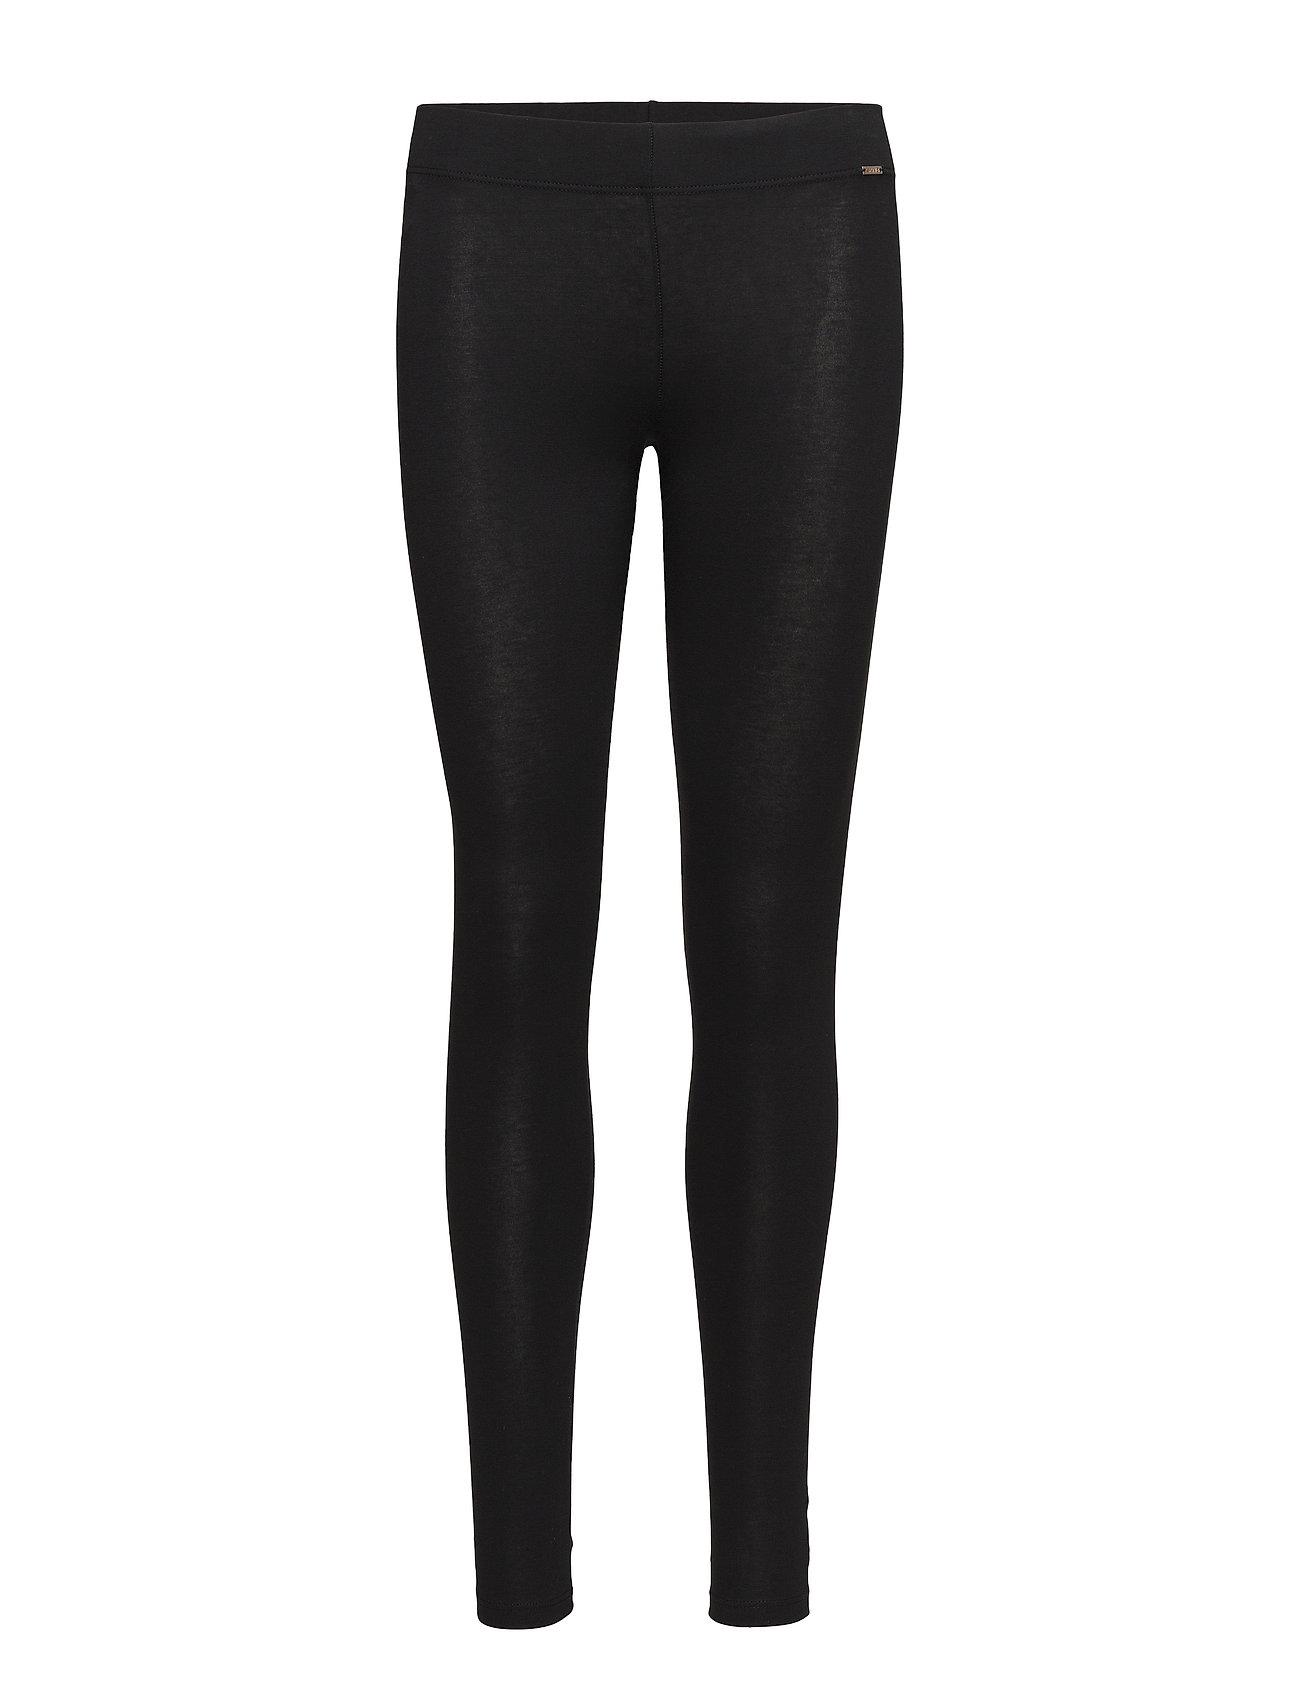 Skiny L. leggings long - BLACK